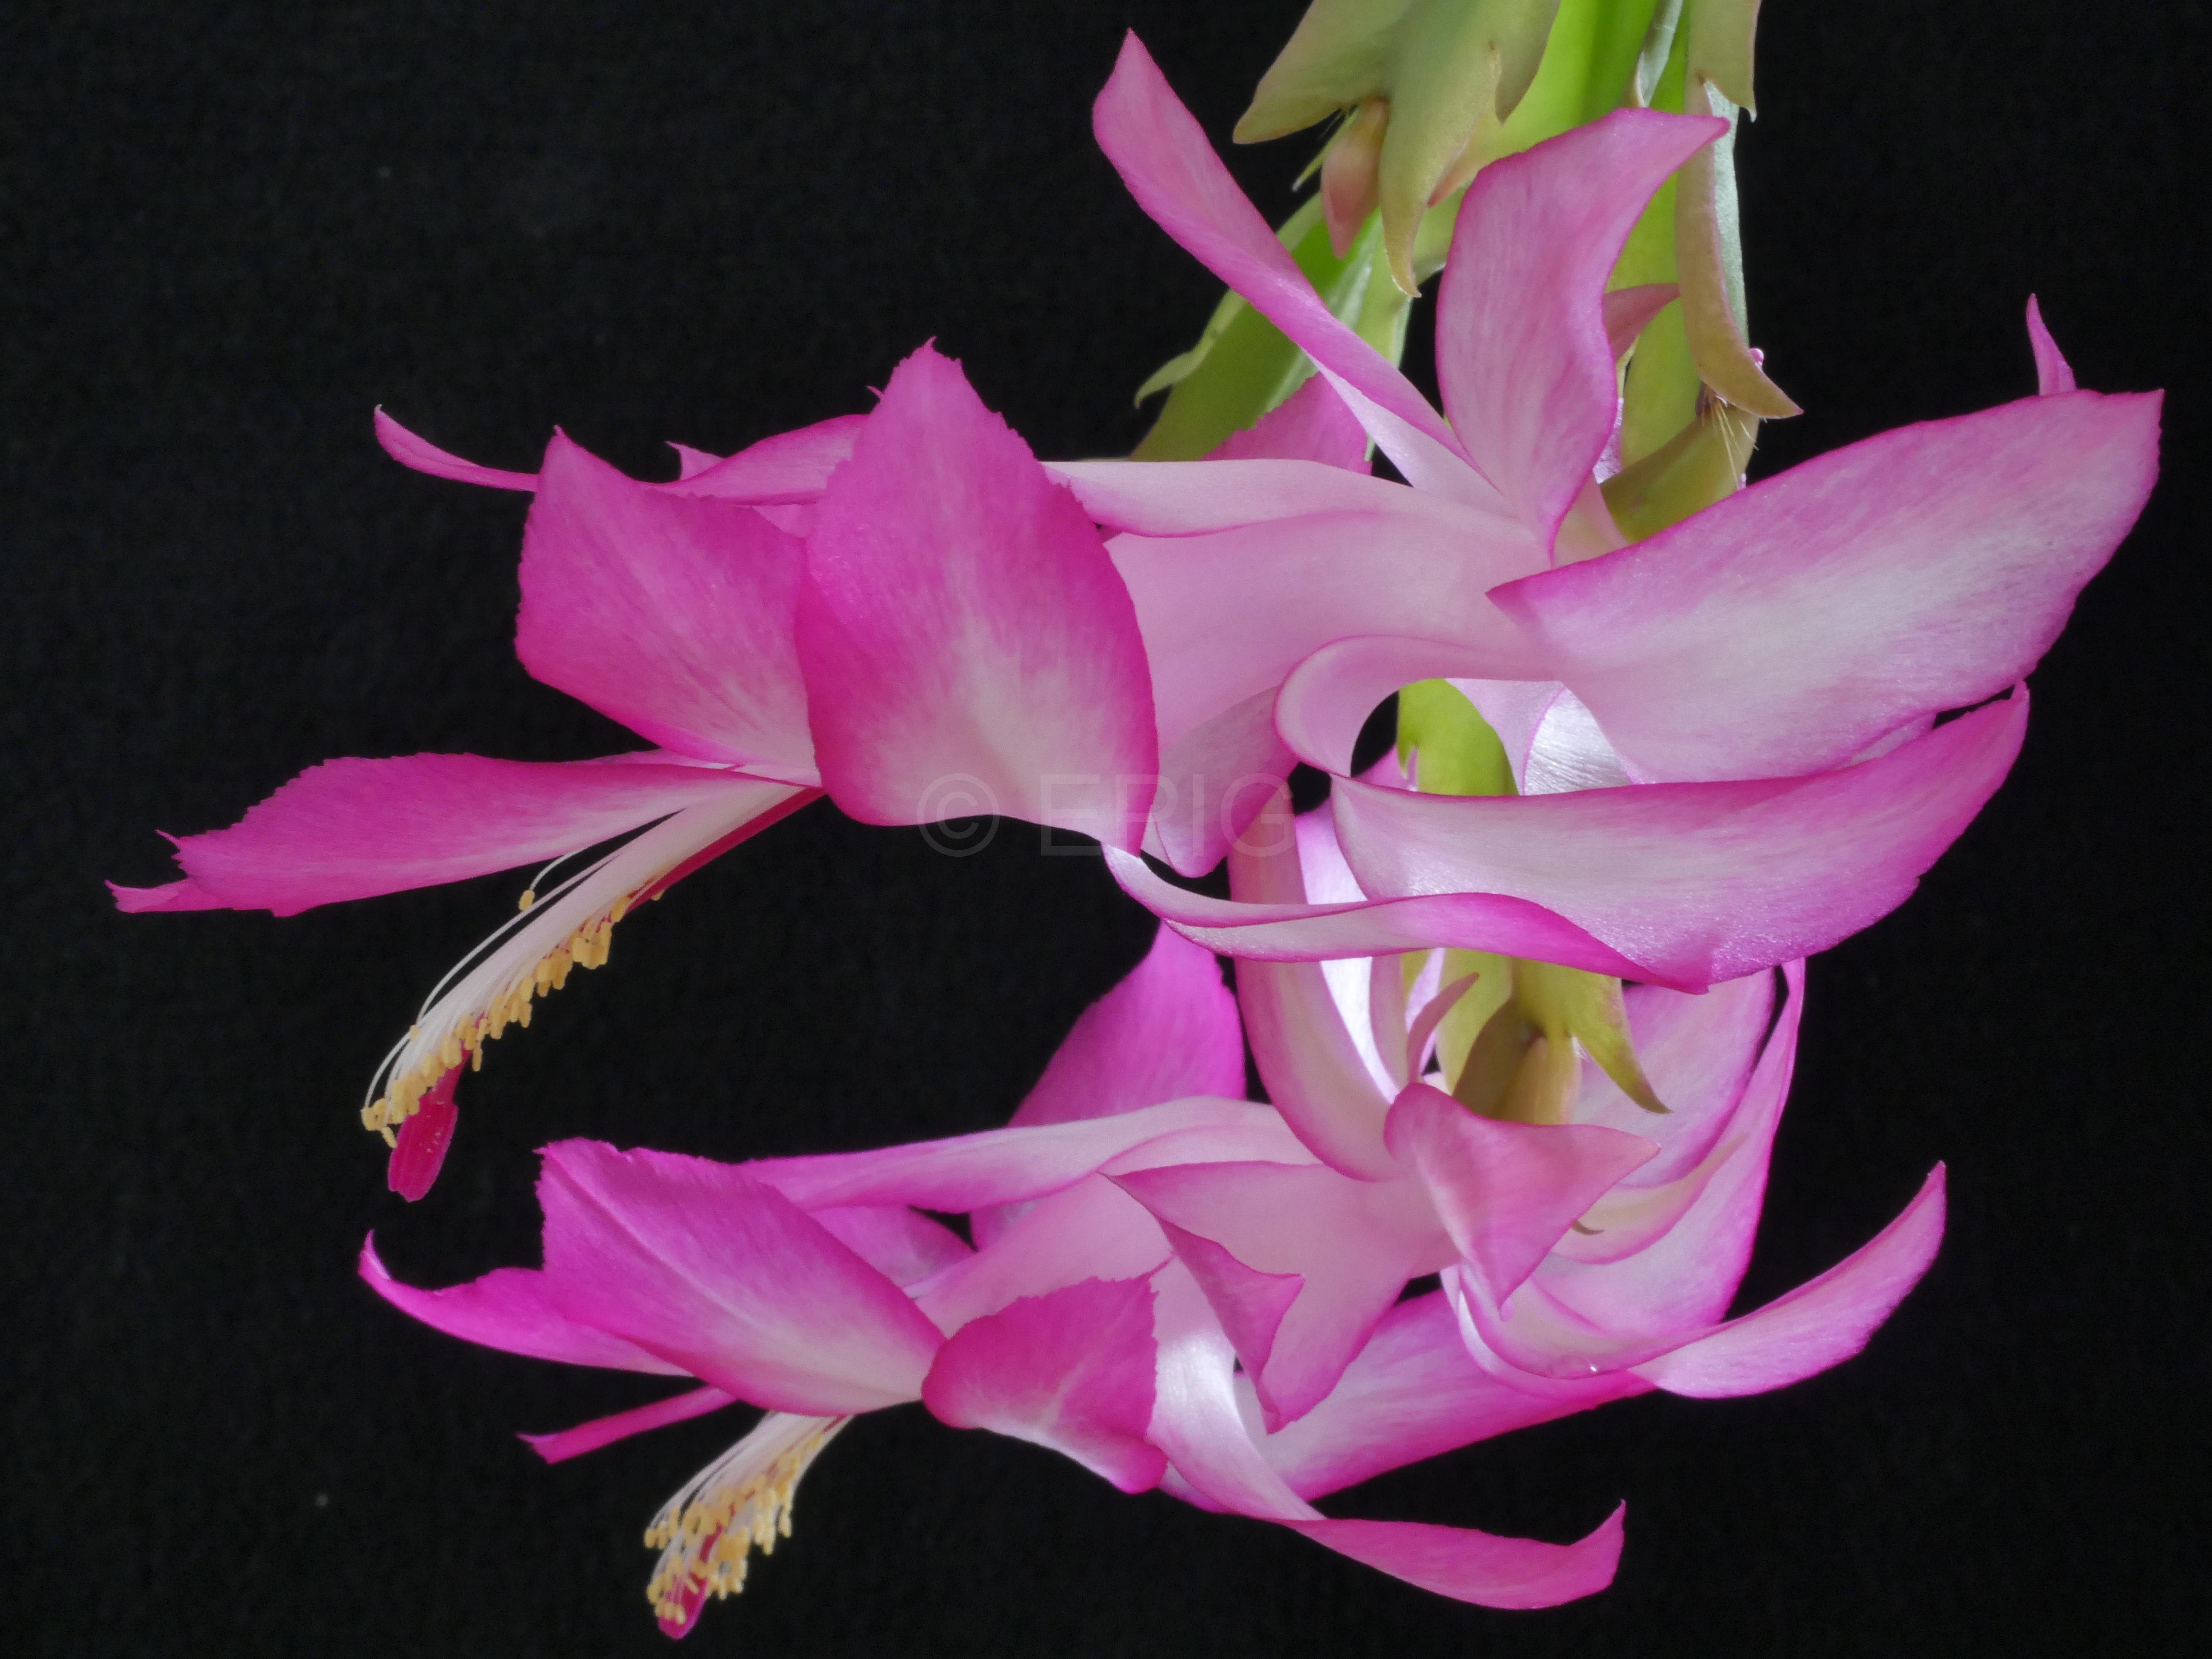 Schlumbergera x reginae PG05 'Pink Regent' (Foto Ruud Tropper)